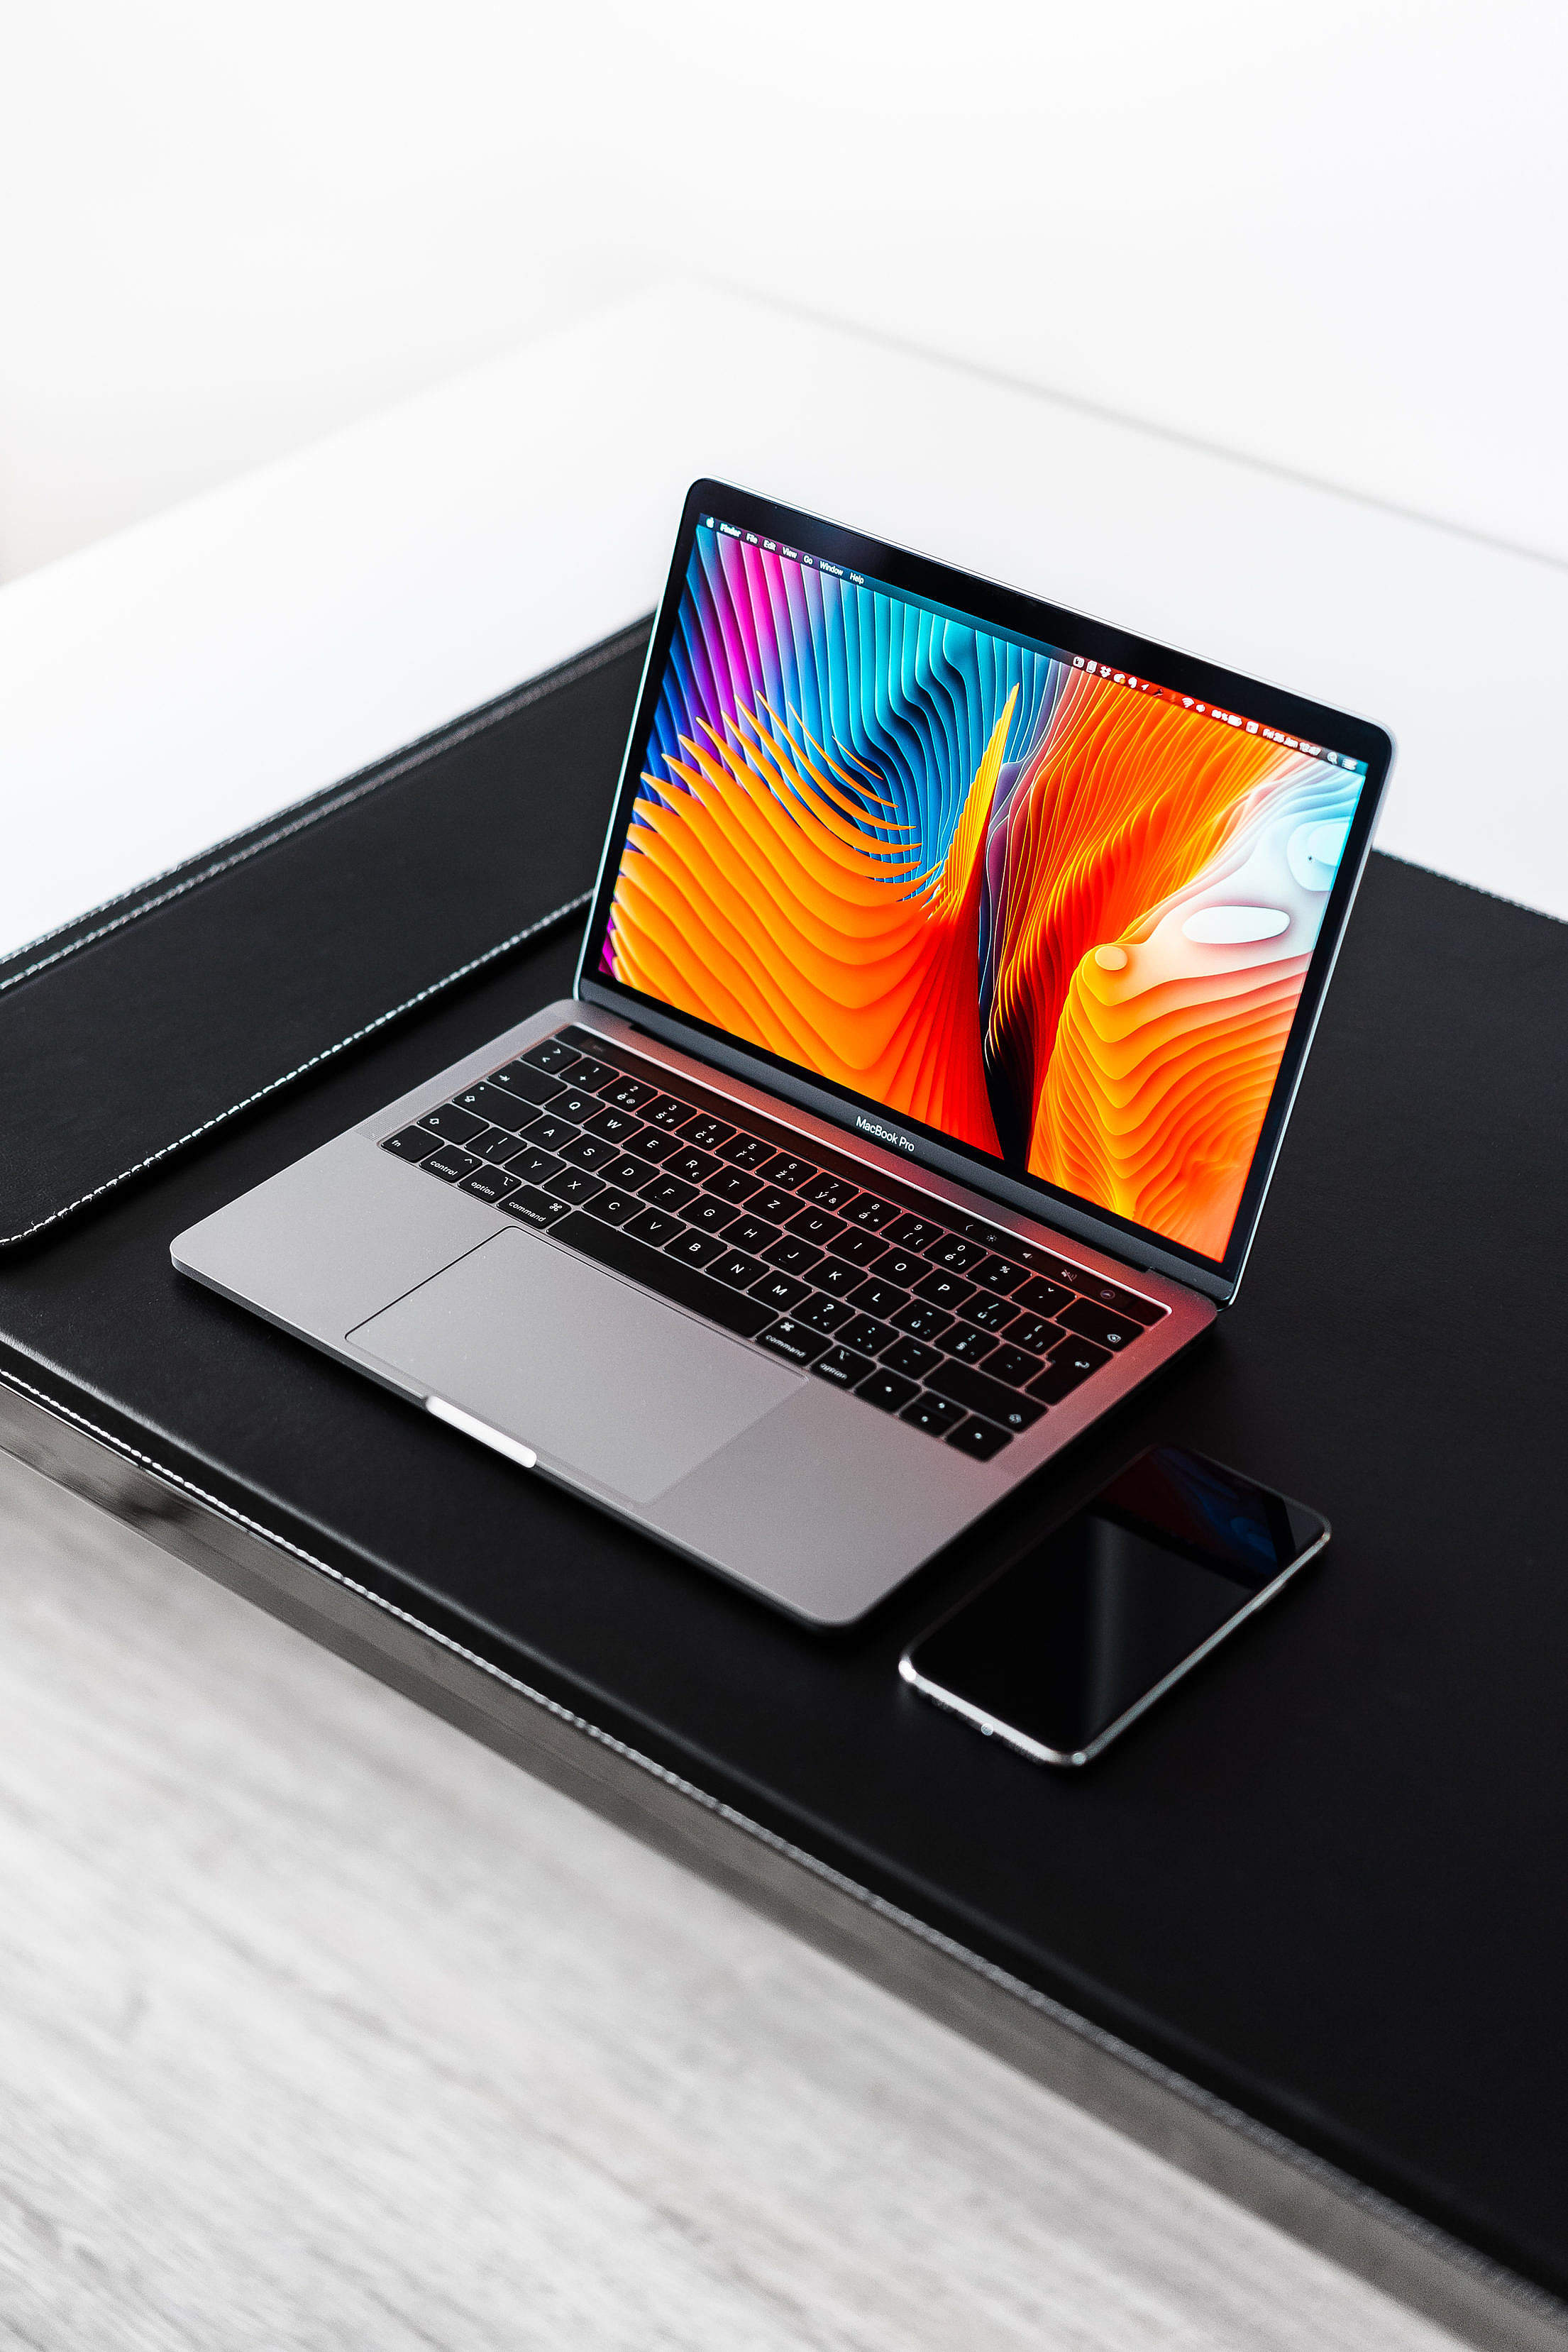 Modern Laptop MacBook Pro Mockup Vertical Free Stock Photo